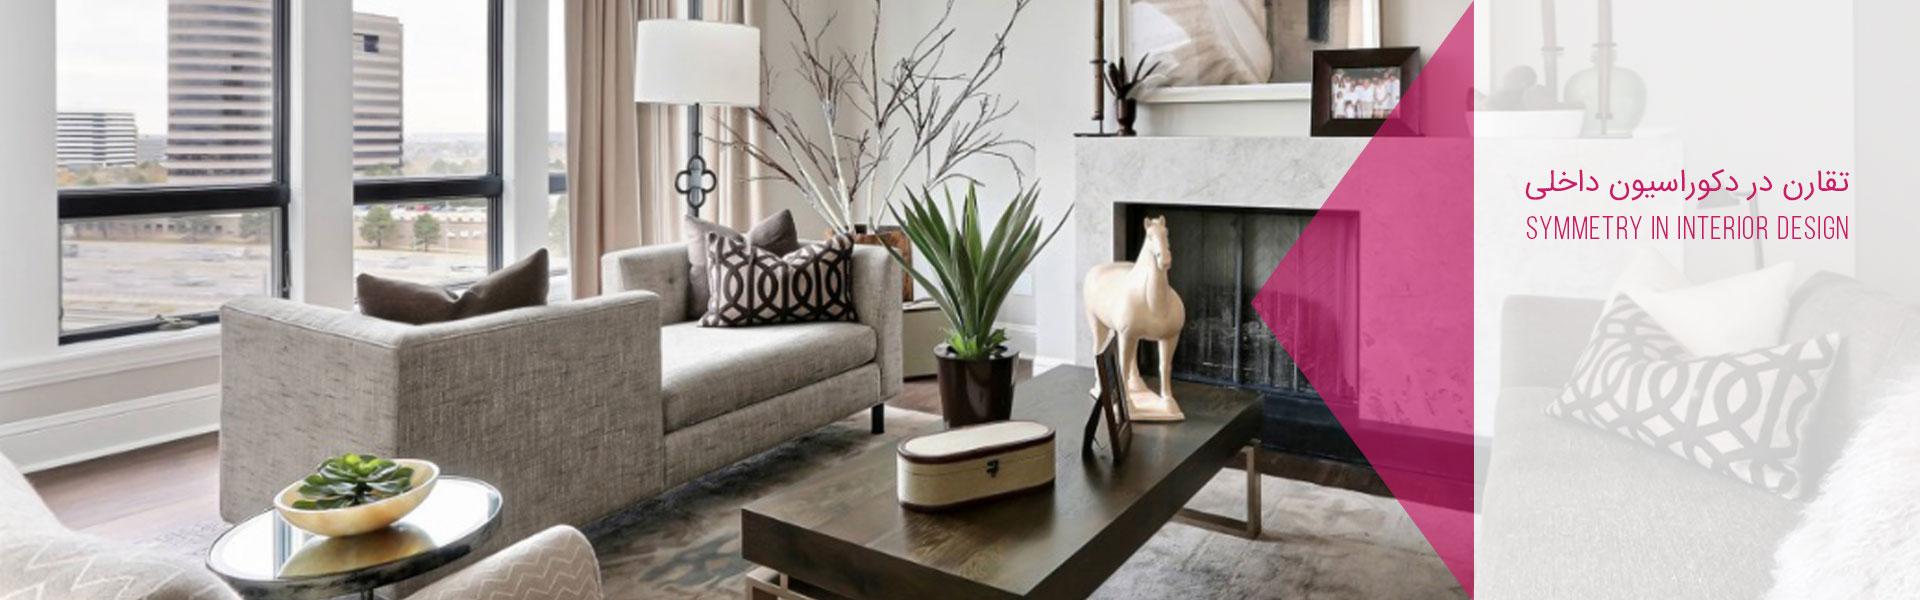 decorasion tagharon - تقارن در دکوراسیون داخلی